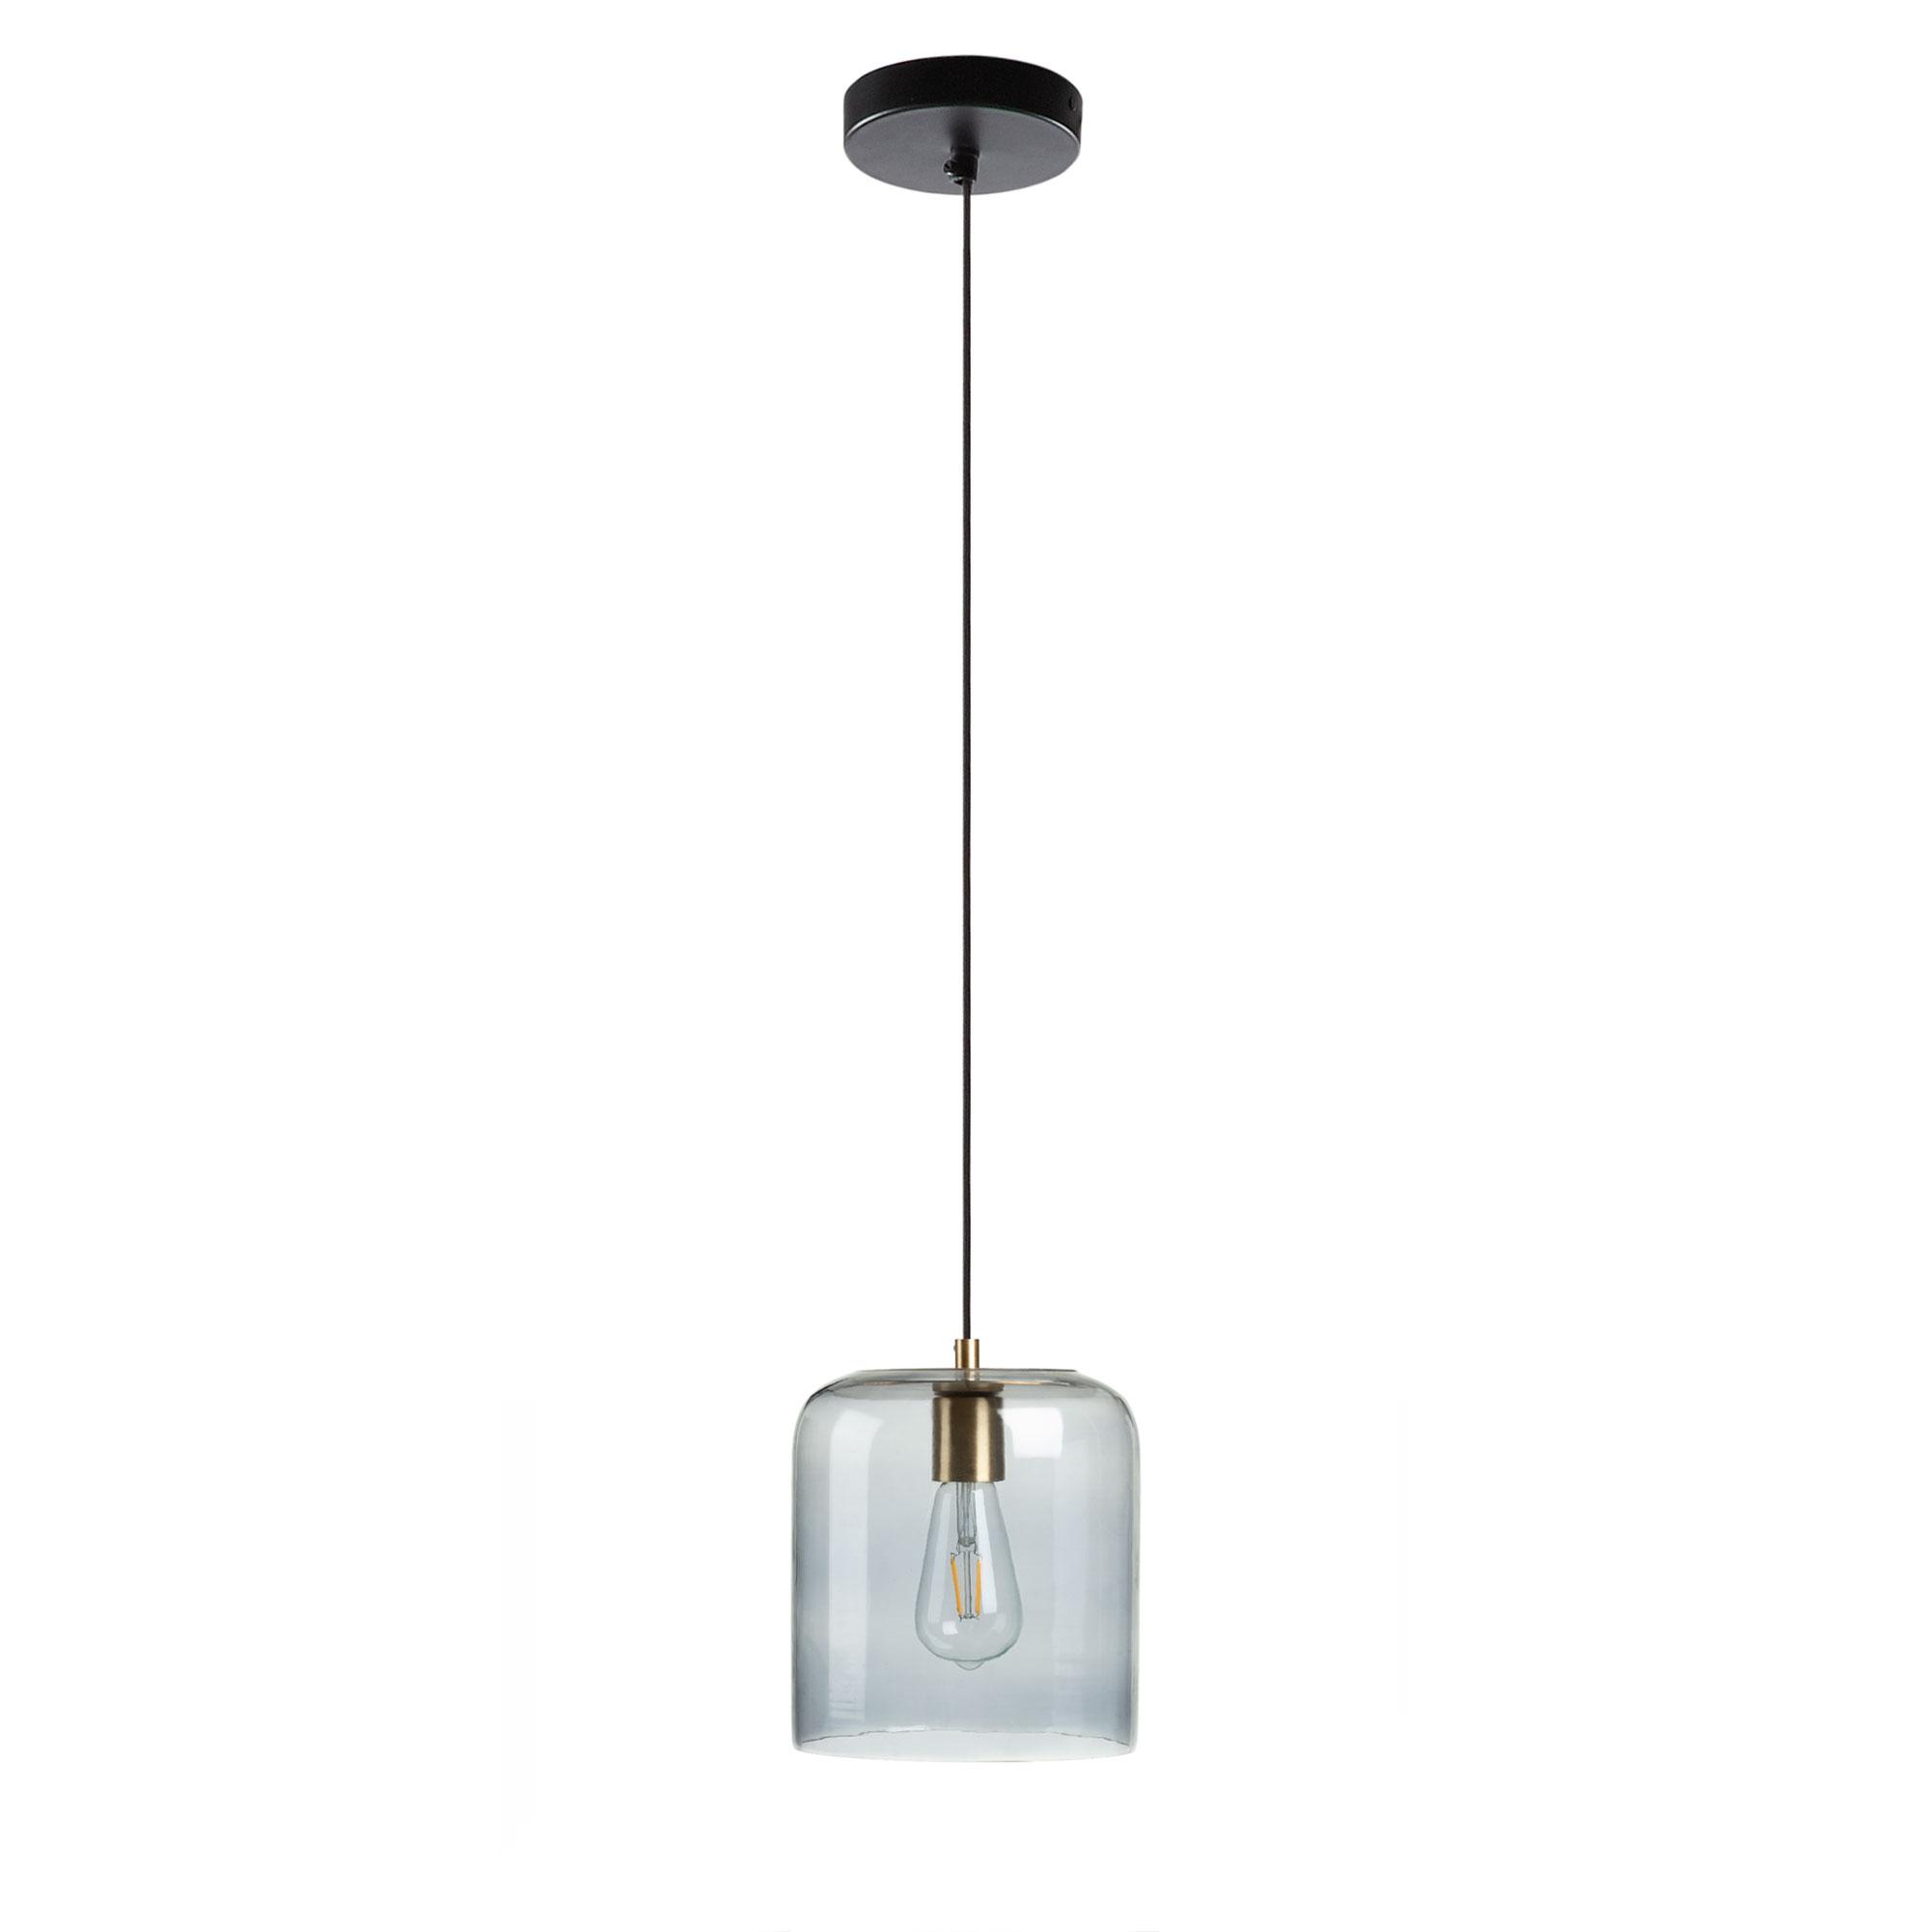 Yanna plafondlamp